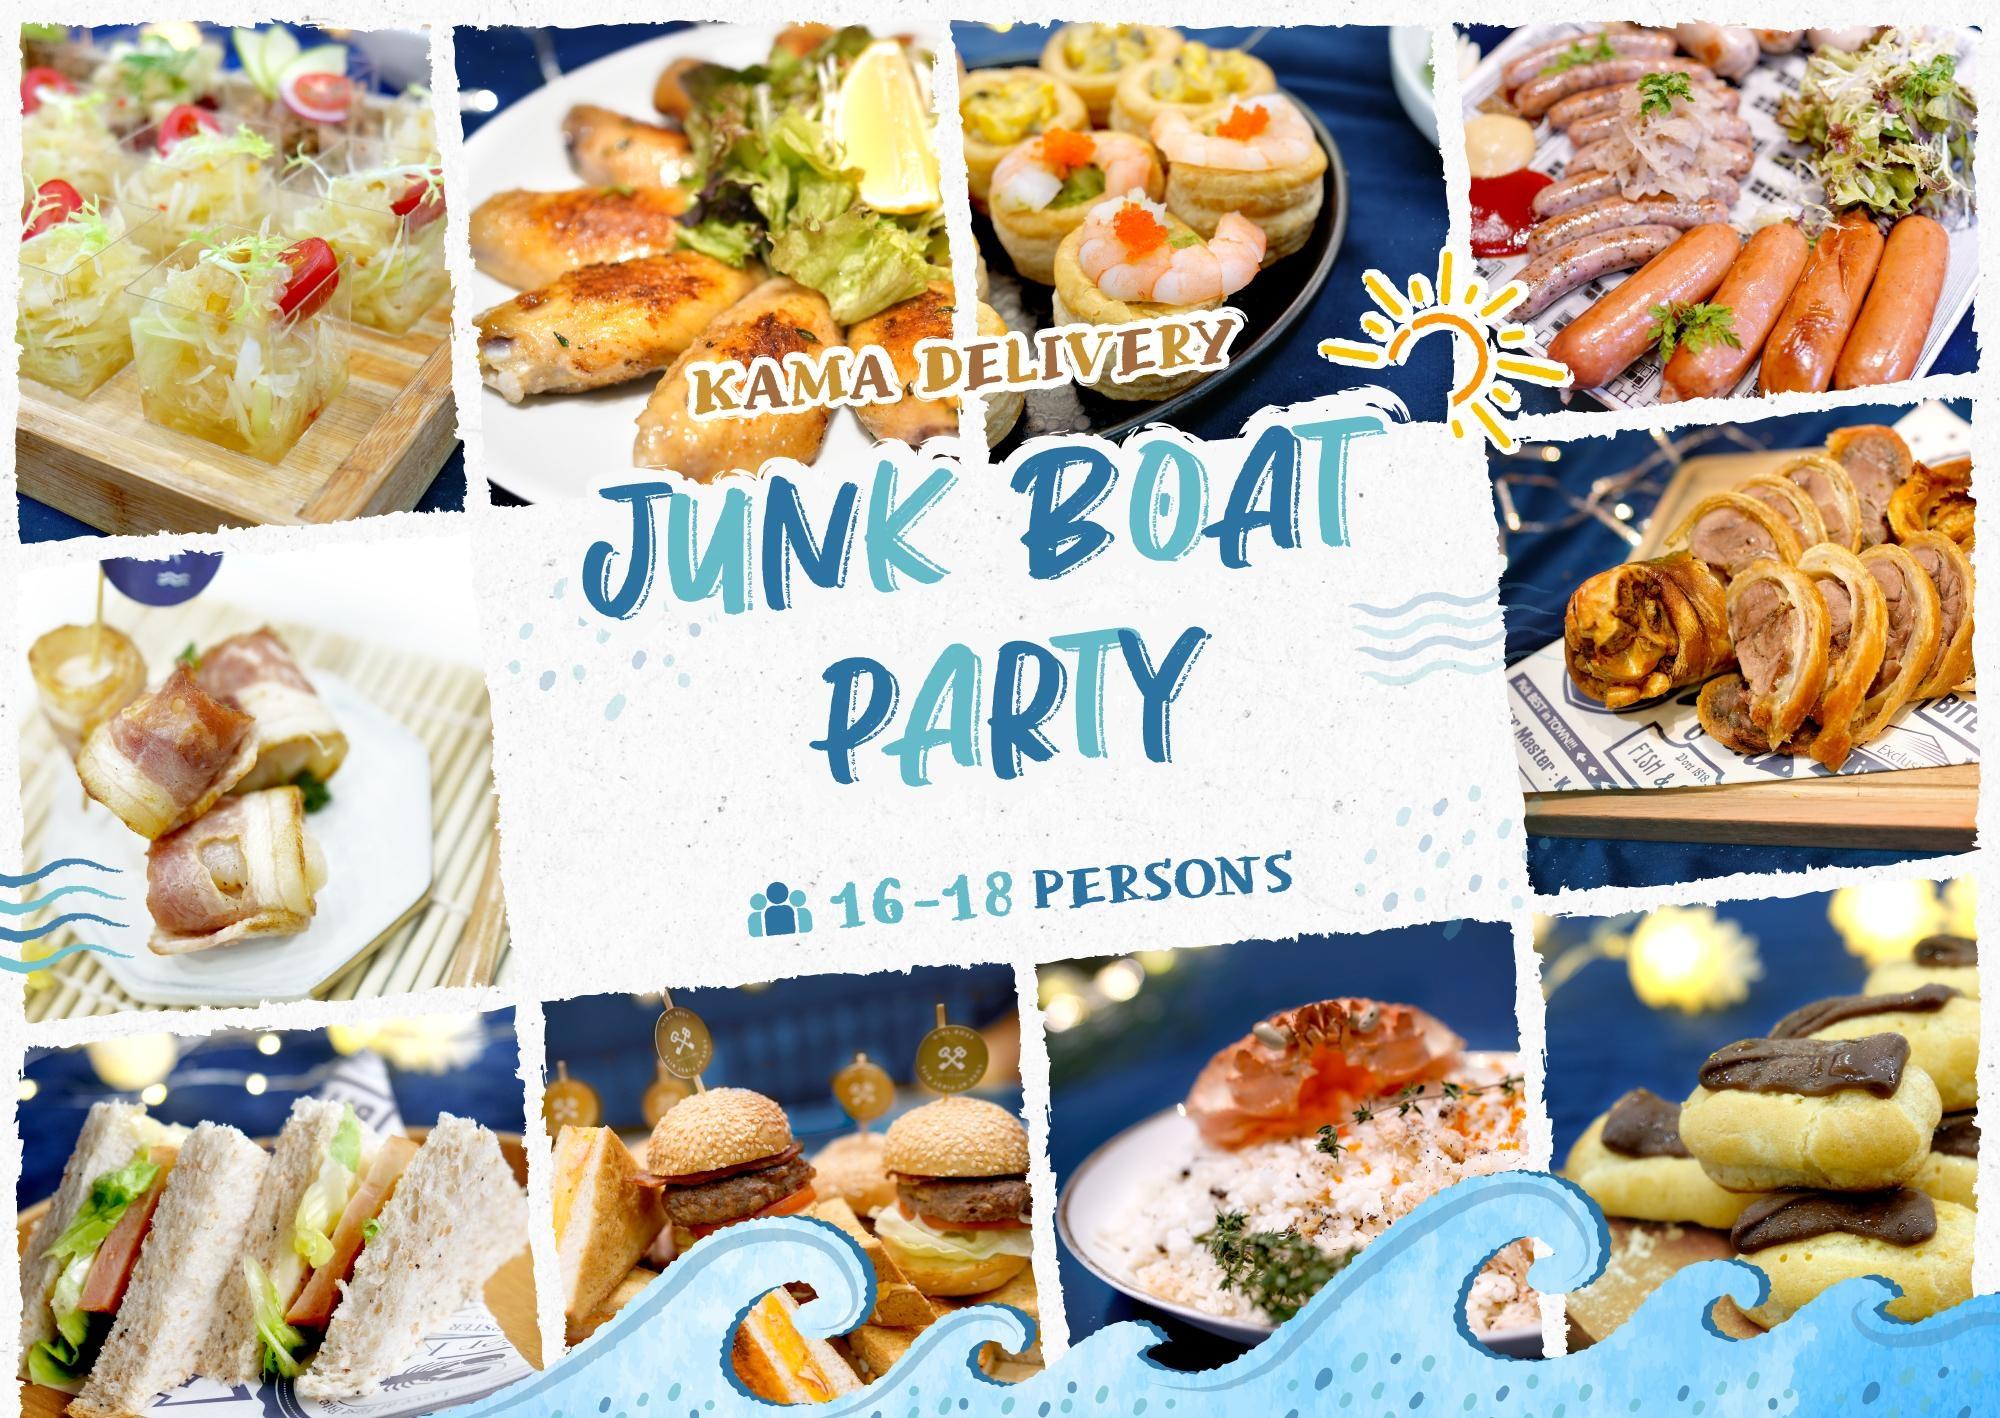 Junk Boat Party Set 食物份量適合16-18人的船P/船河到會派對享用|Kama Delivery美食到會外賣服務